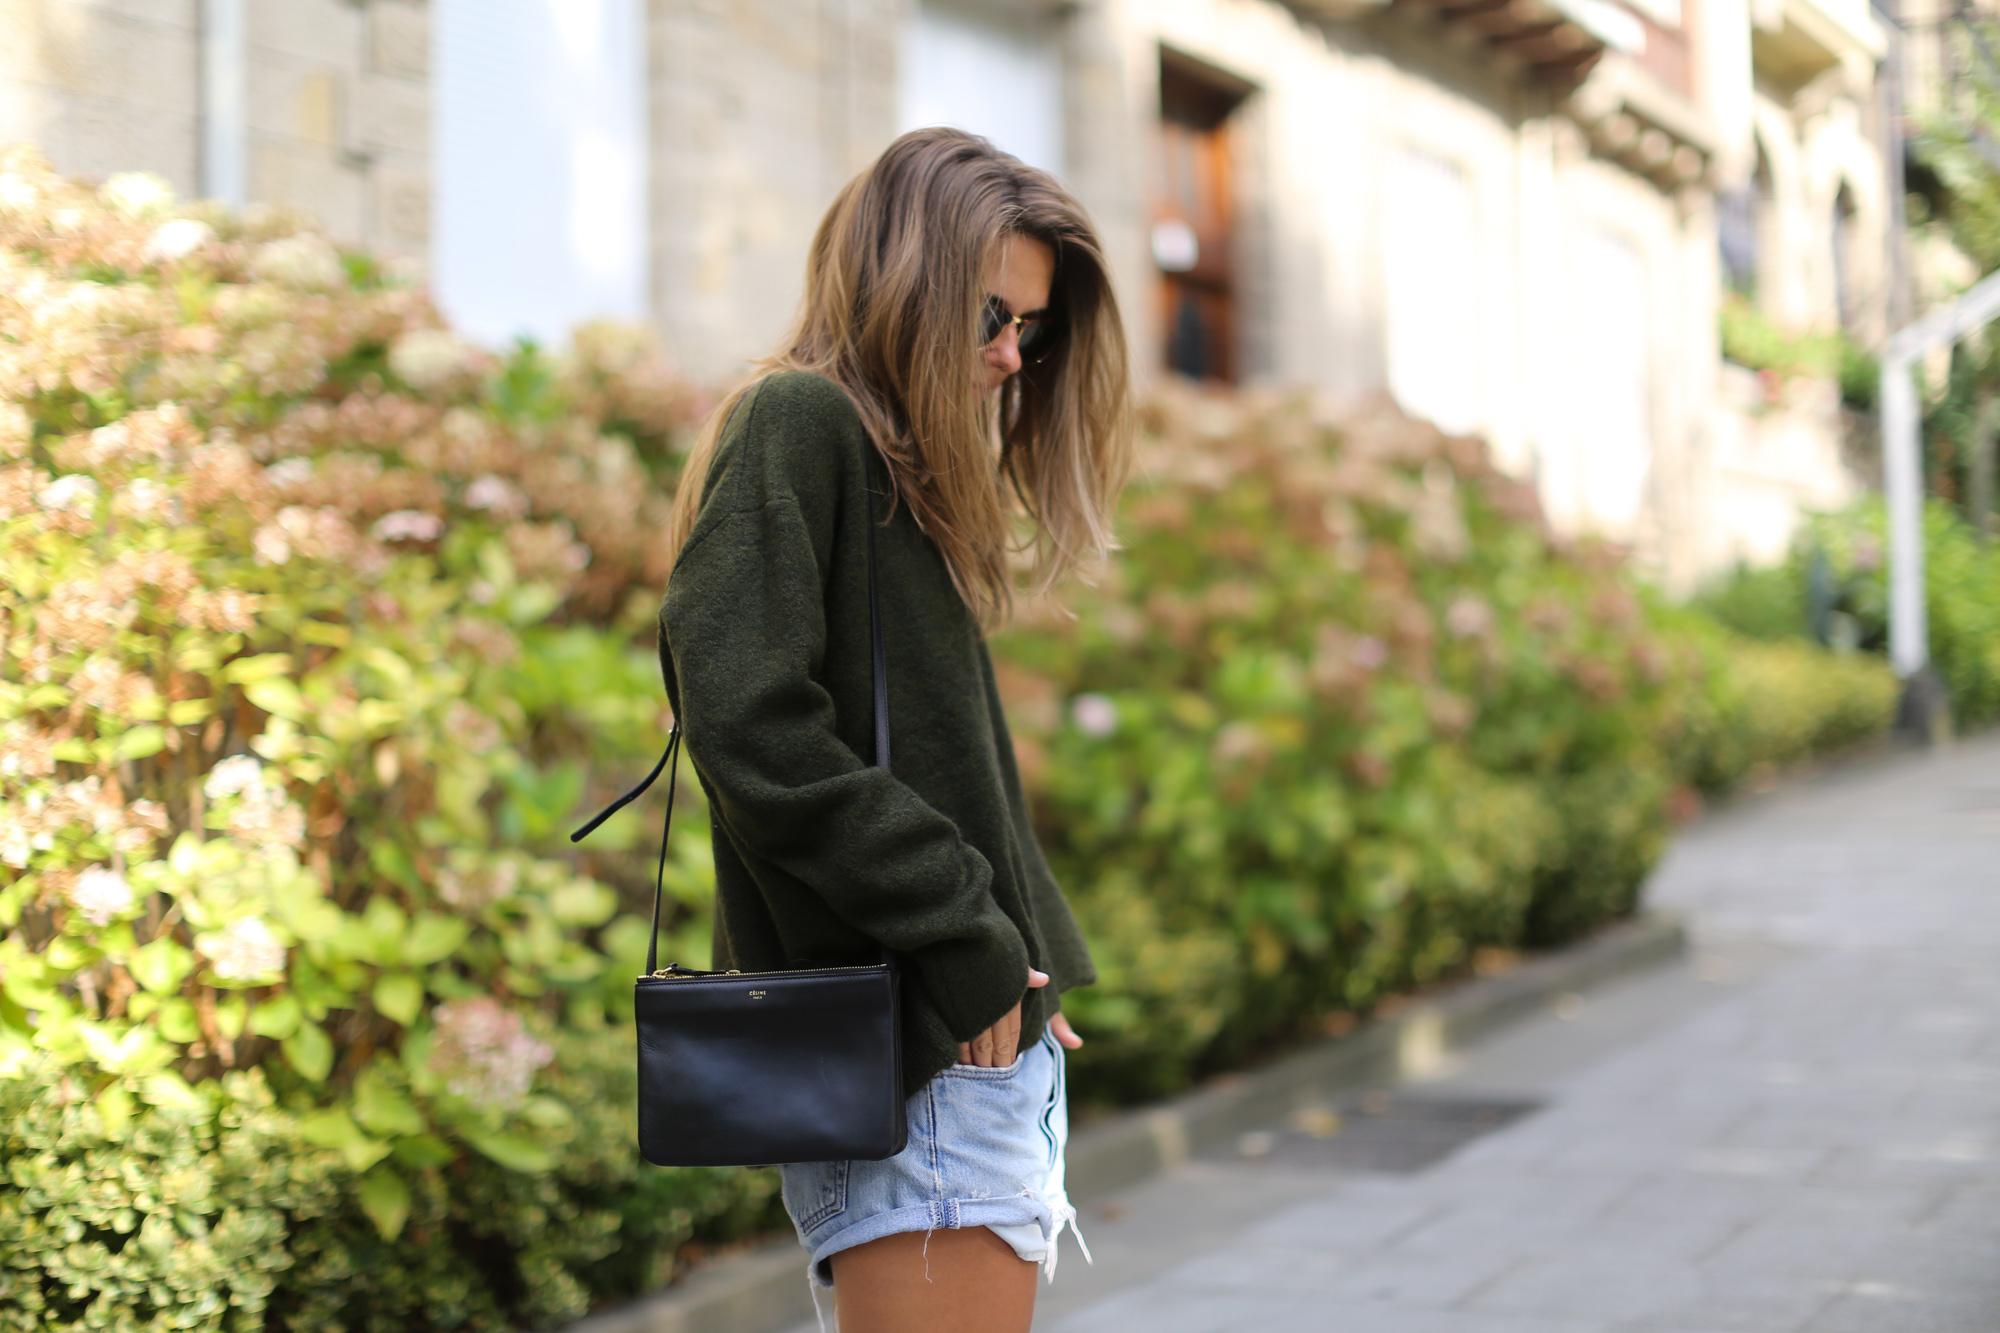 Clochet-streetstyle-levis-501-vintage-zara-khaki-knit-sliders-4